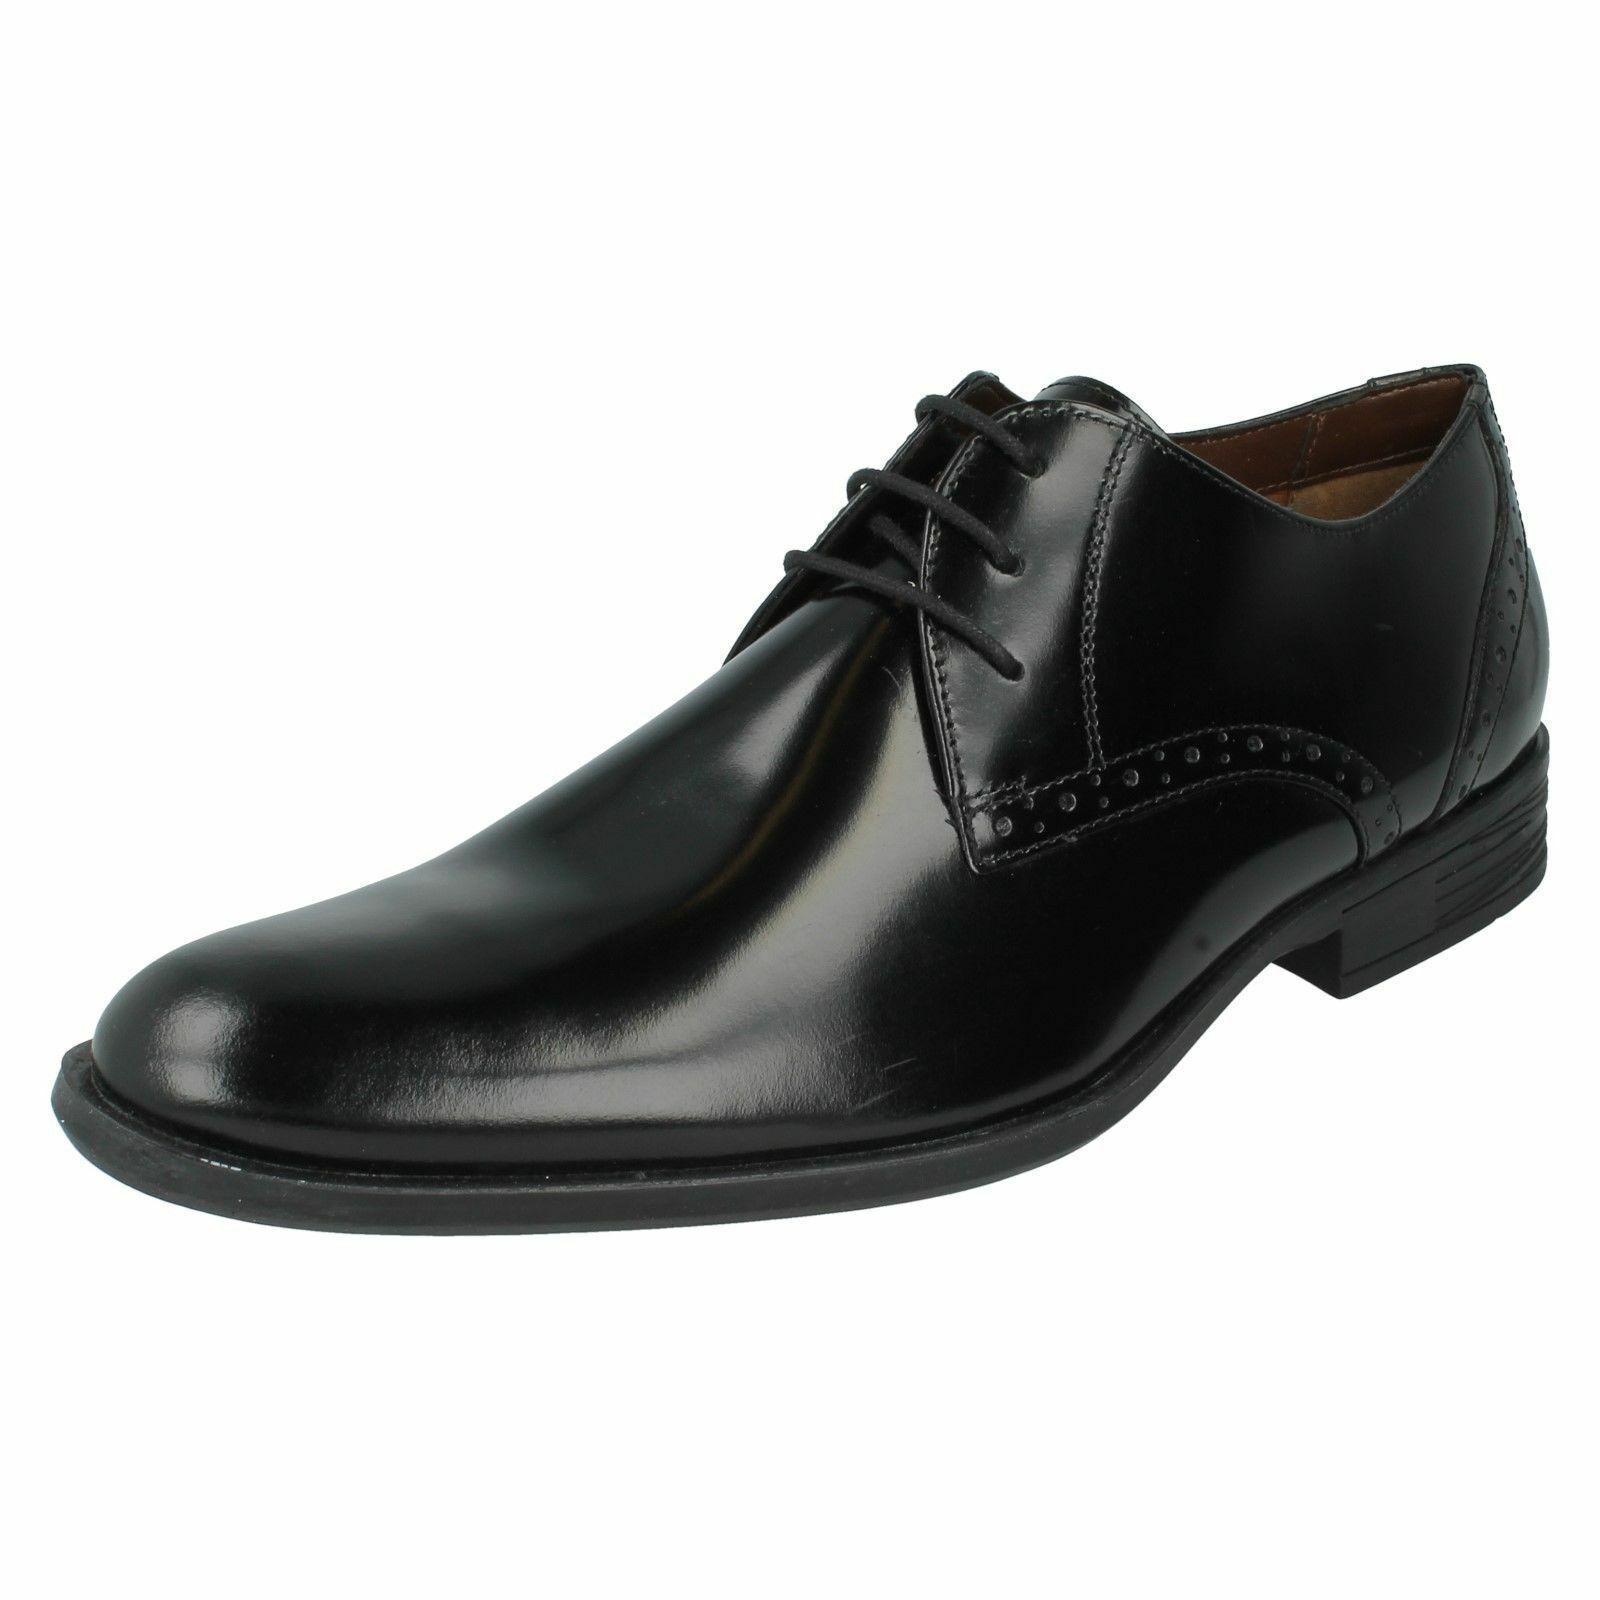 Herren Hush Puppies Schwarz Poliert Leder Formelle Schuhe Style Kensington